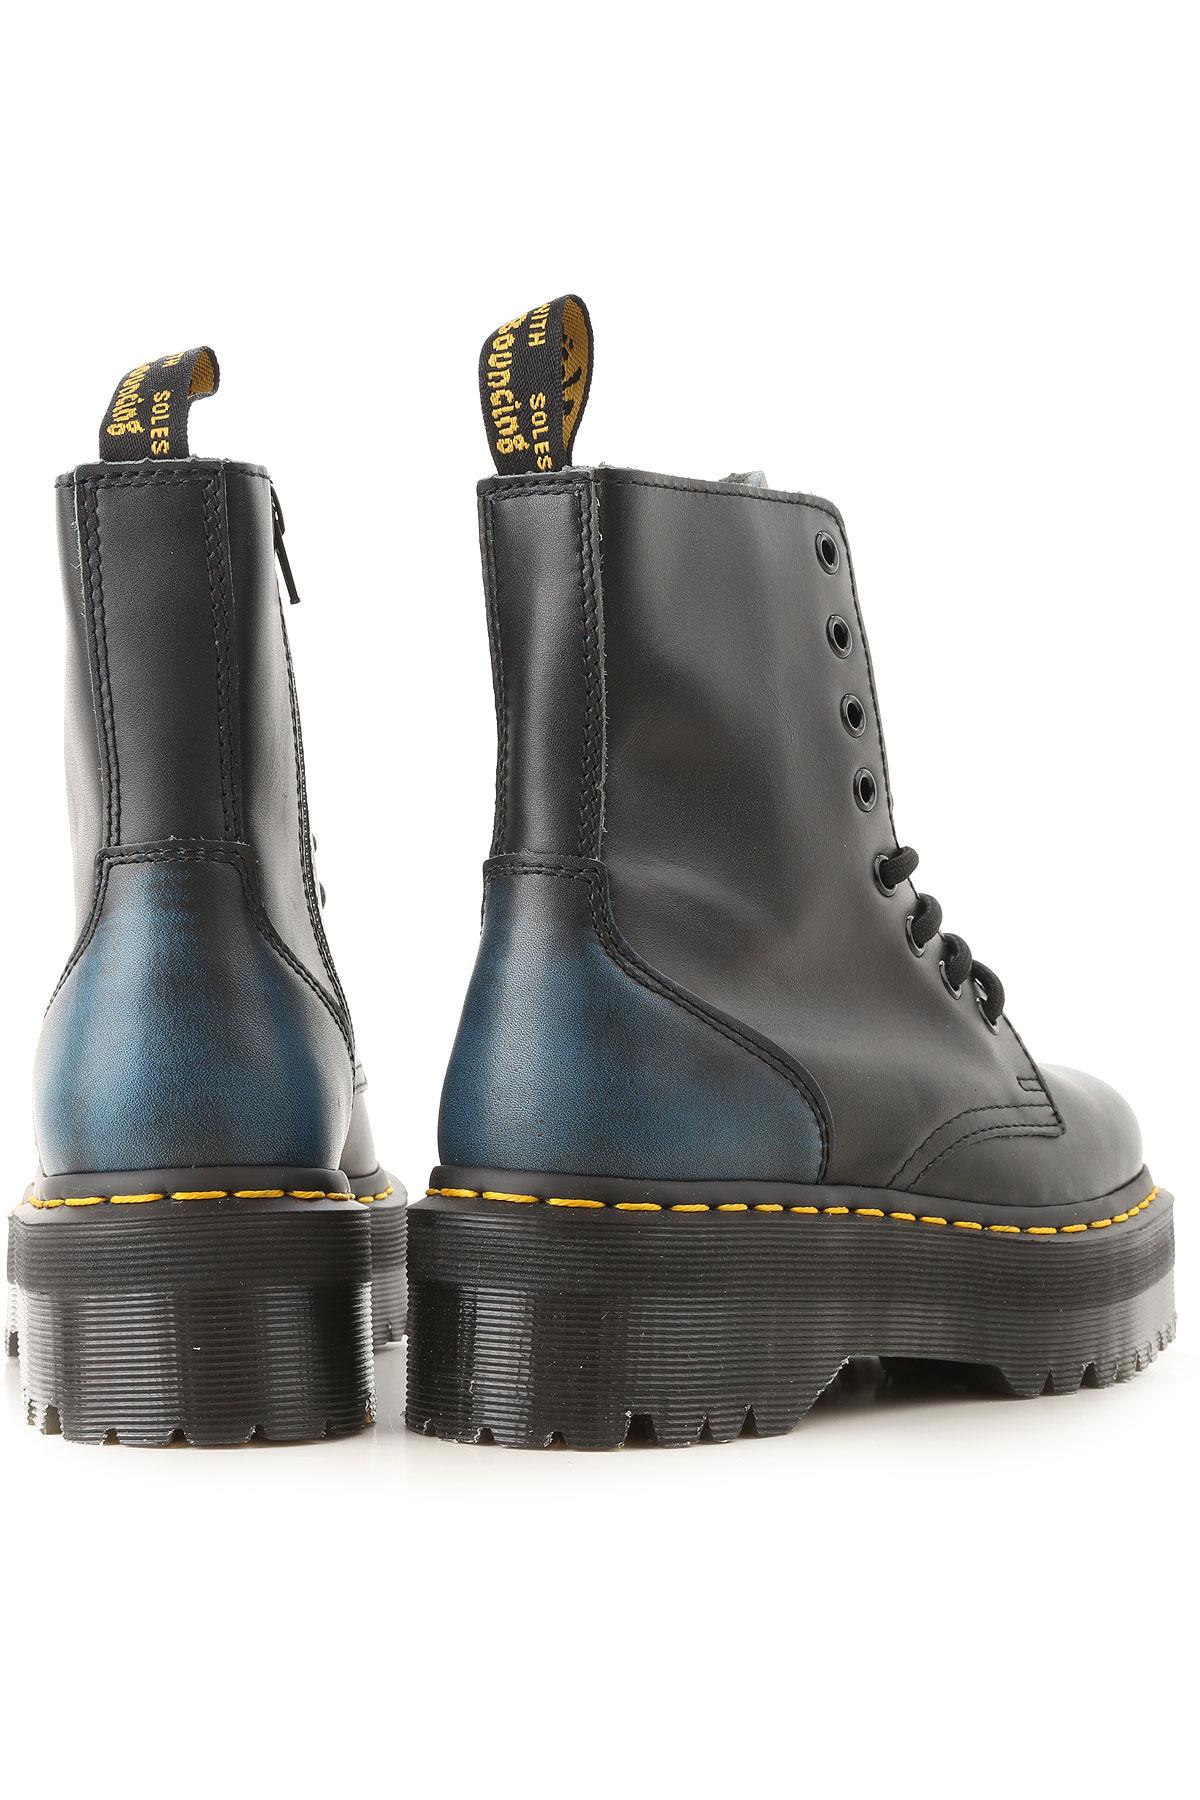 Mujer Martens 2018 invierno 19 Para Marino Otoño Dr Negro Zapatos Azul qUwtdBB